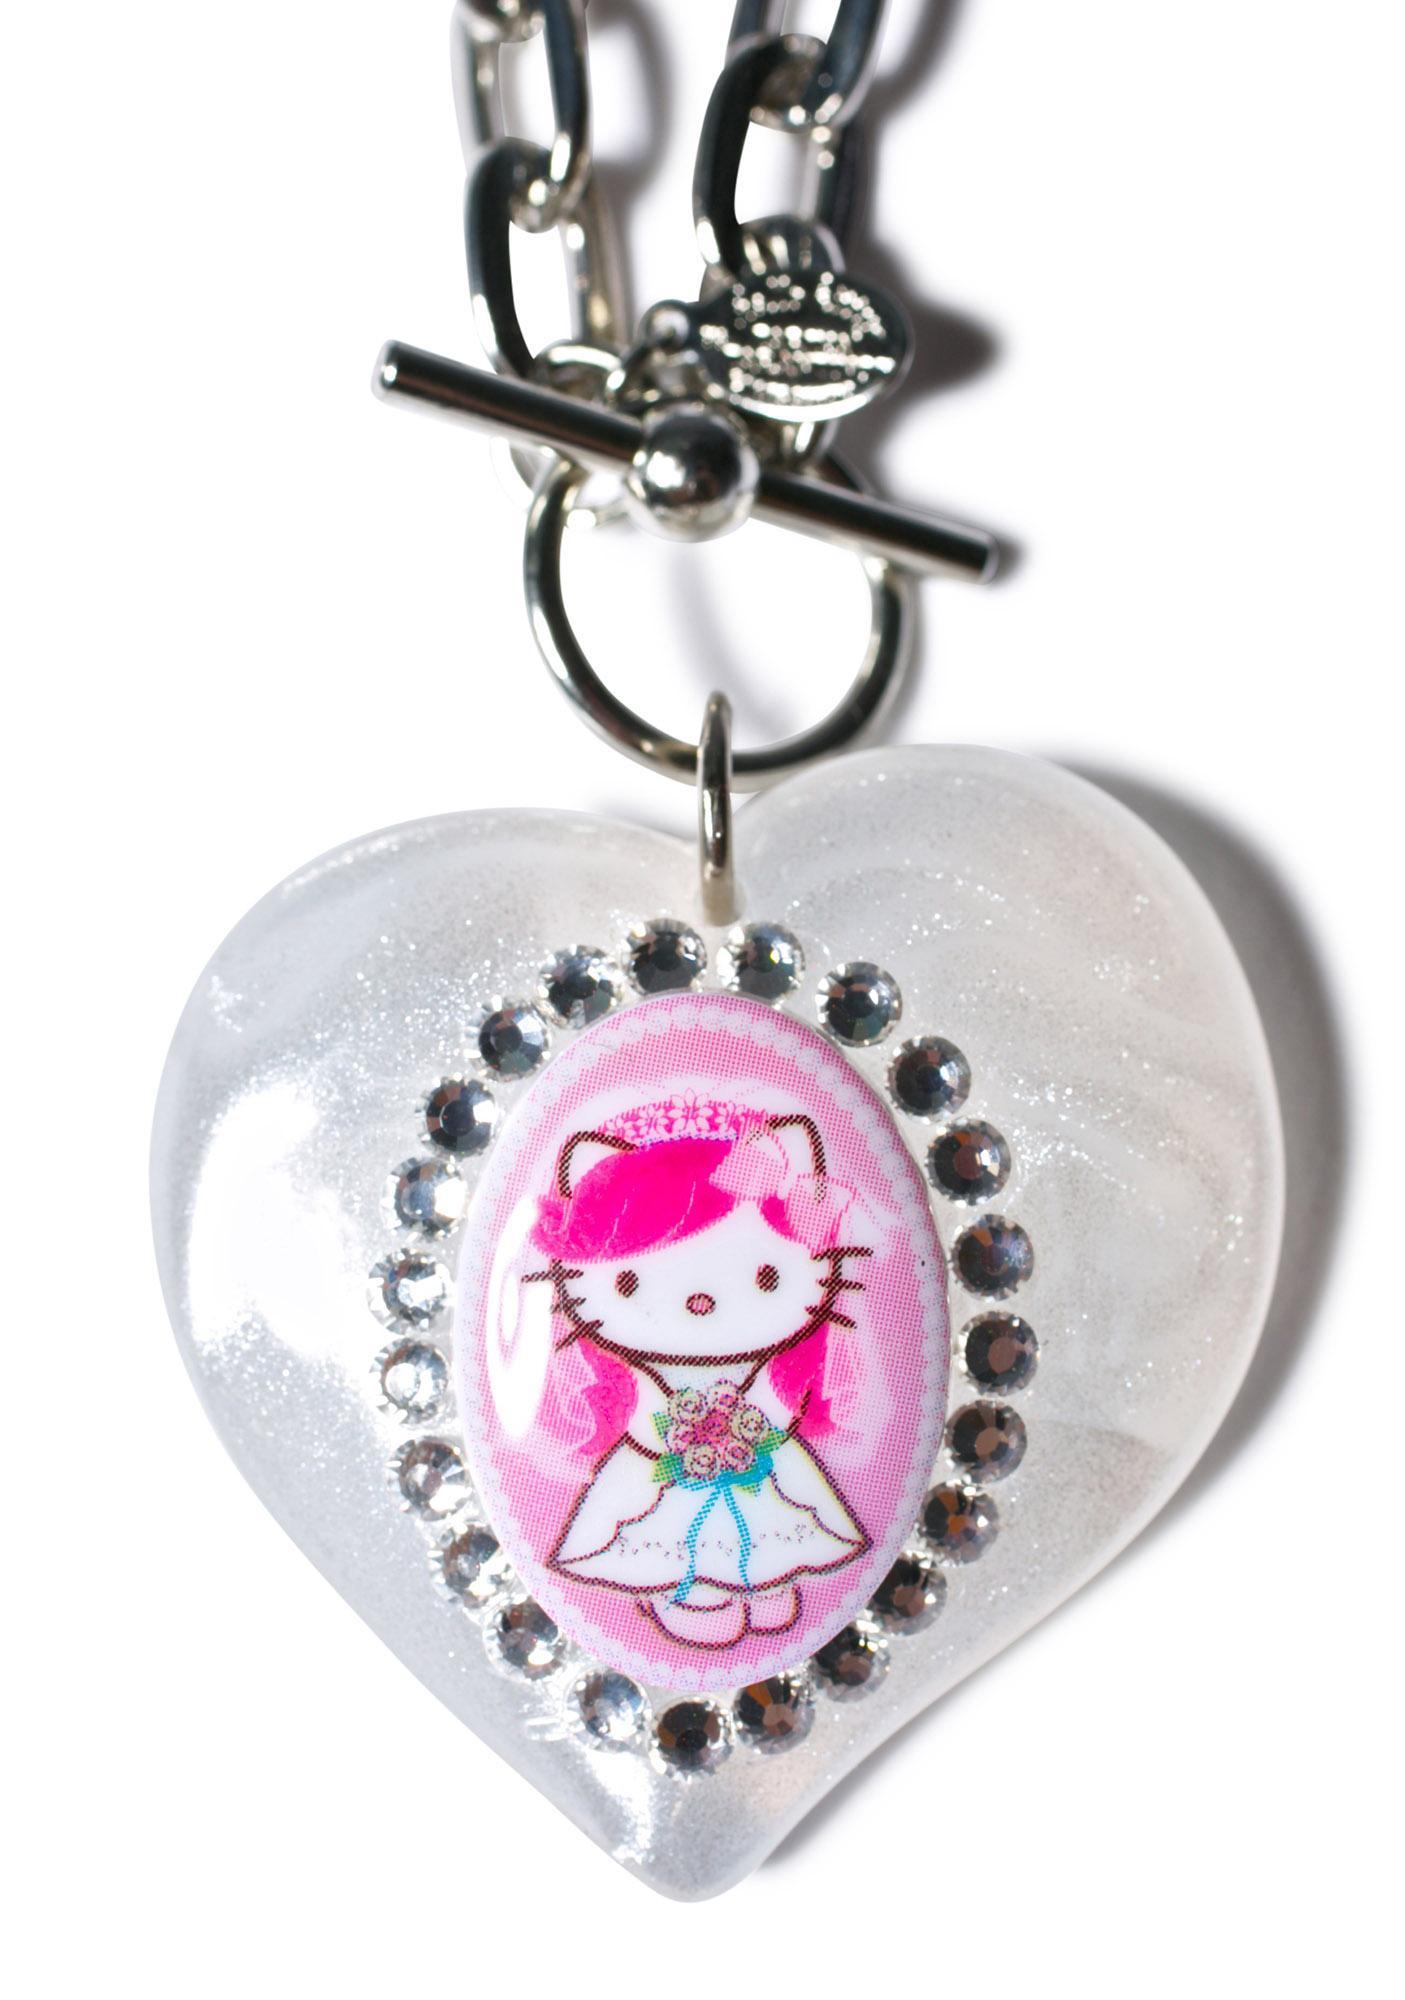 Tarina Tarantino Puff Heart Necklace